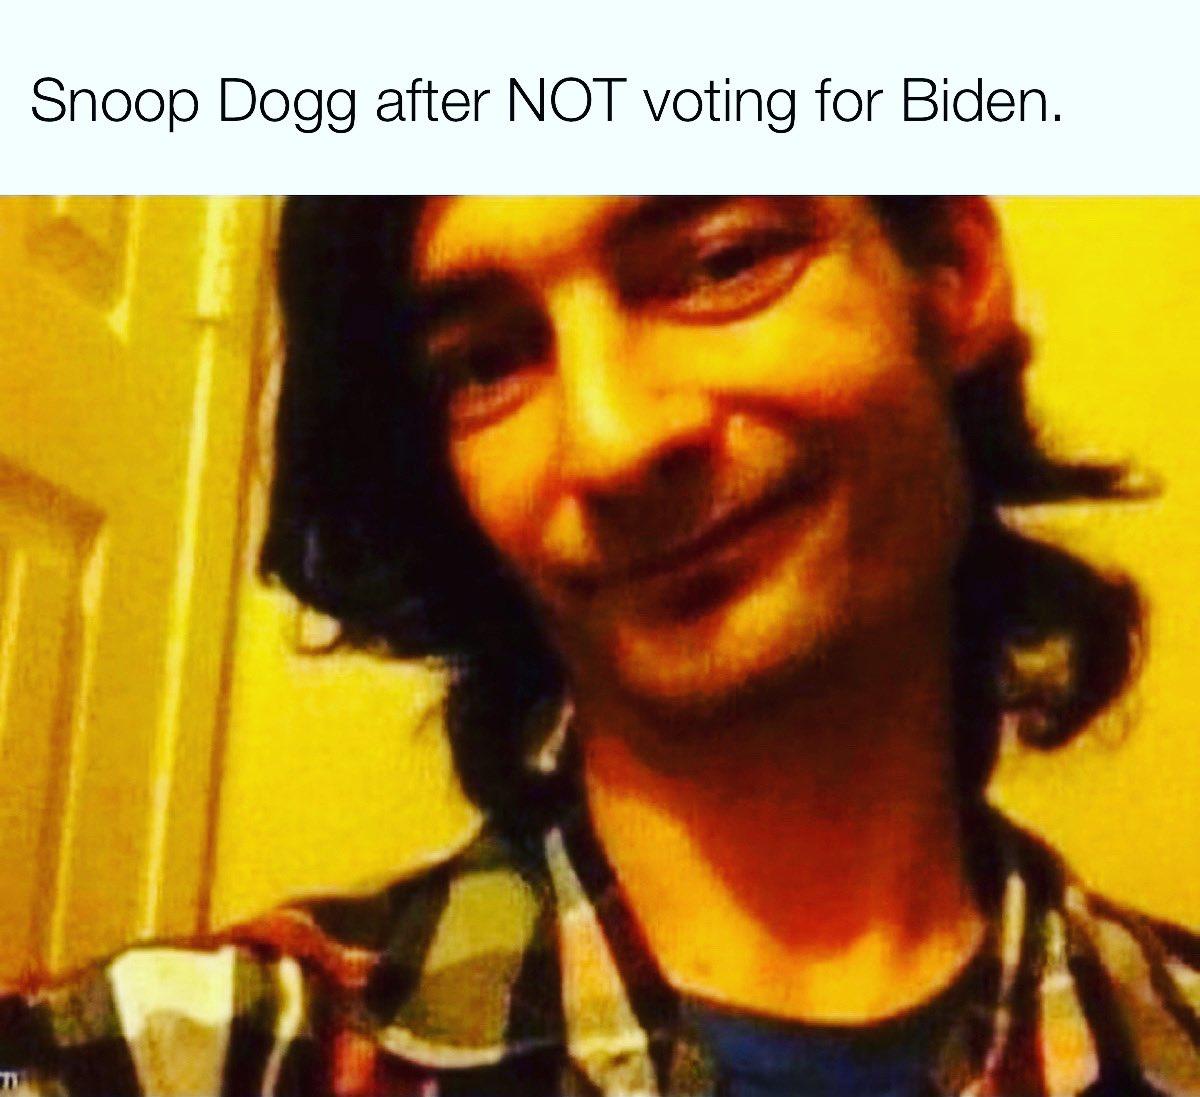 Go vote!@snoopdogg You rock Snoop! #memezlab #snoopdogg #snoopdoggmeme #joebiden #biden #bidenmemes #biden2020 #creepyjoebiden #memes #meme #dankmemes #memes#memesdaily #memepage #memer #memez #memed #memedaily #memelife #memestagram #memestar #funnymemes #funny #hiphoppic.twitter.com/9KuAwWhGEn